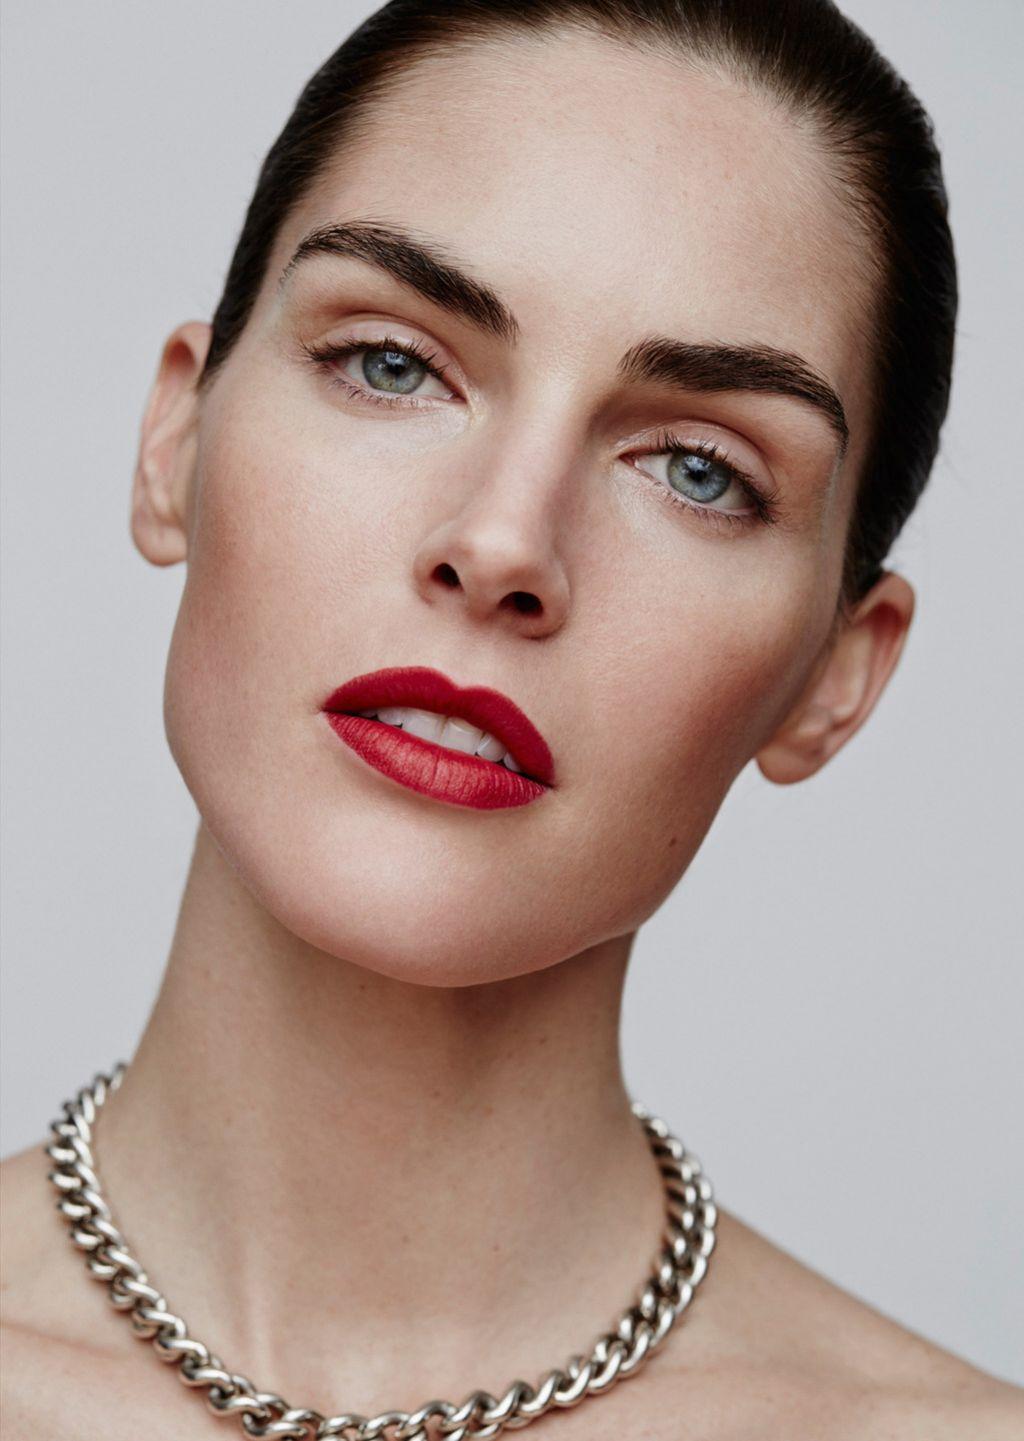 Hilary Rhoda Photoshoot For Vamp Magazine 3 2015